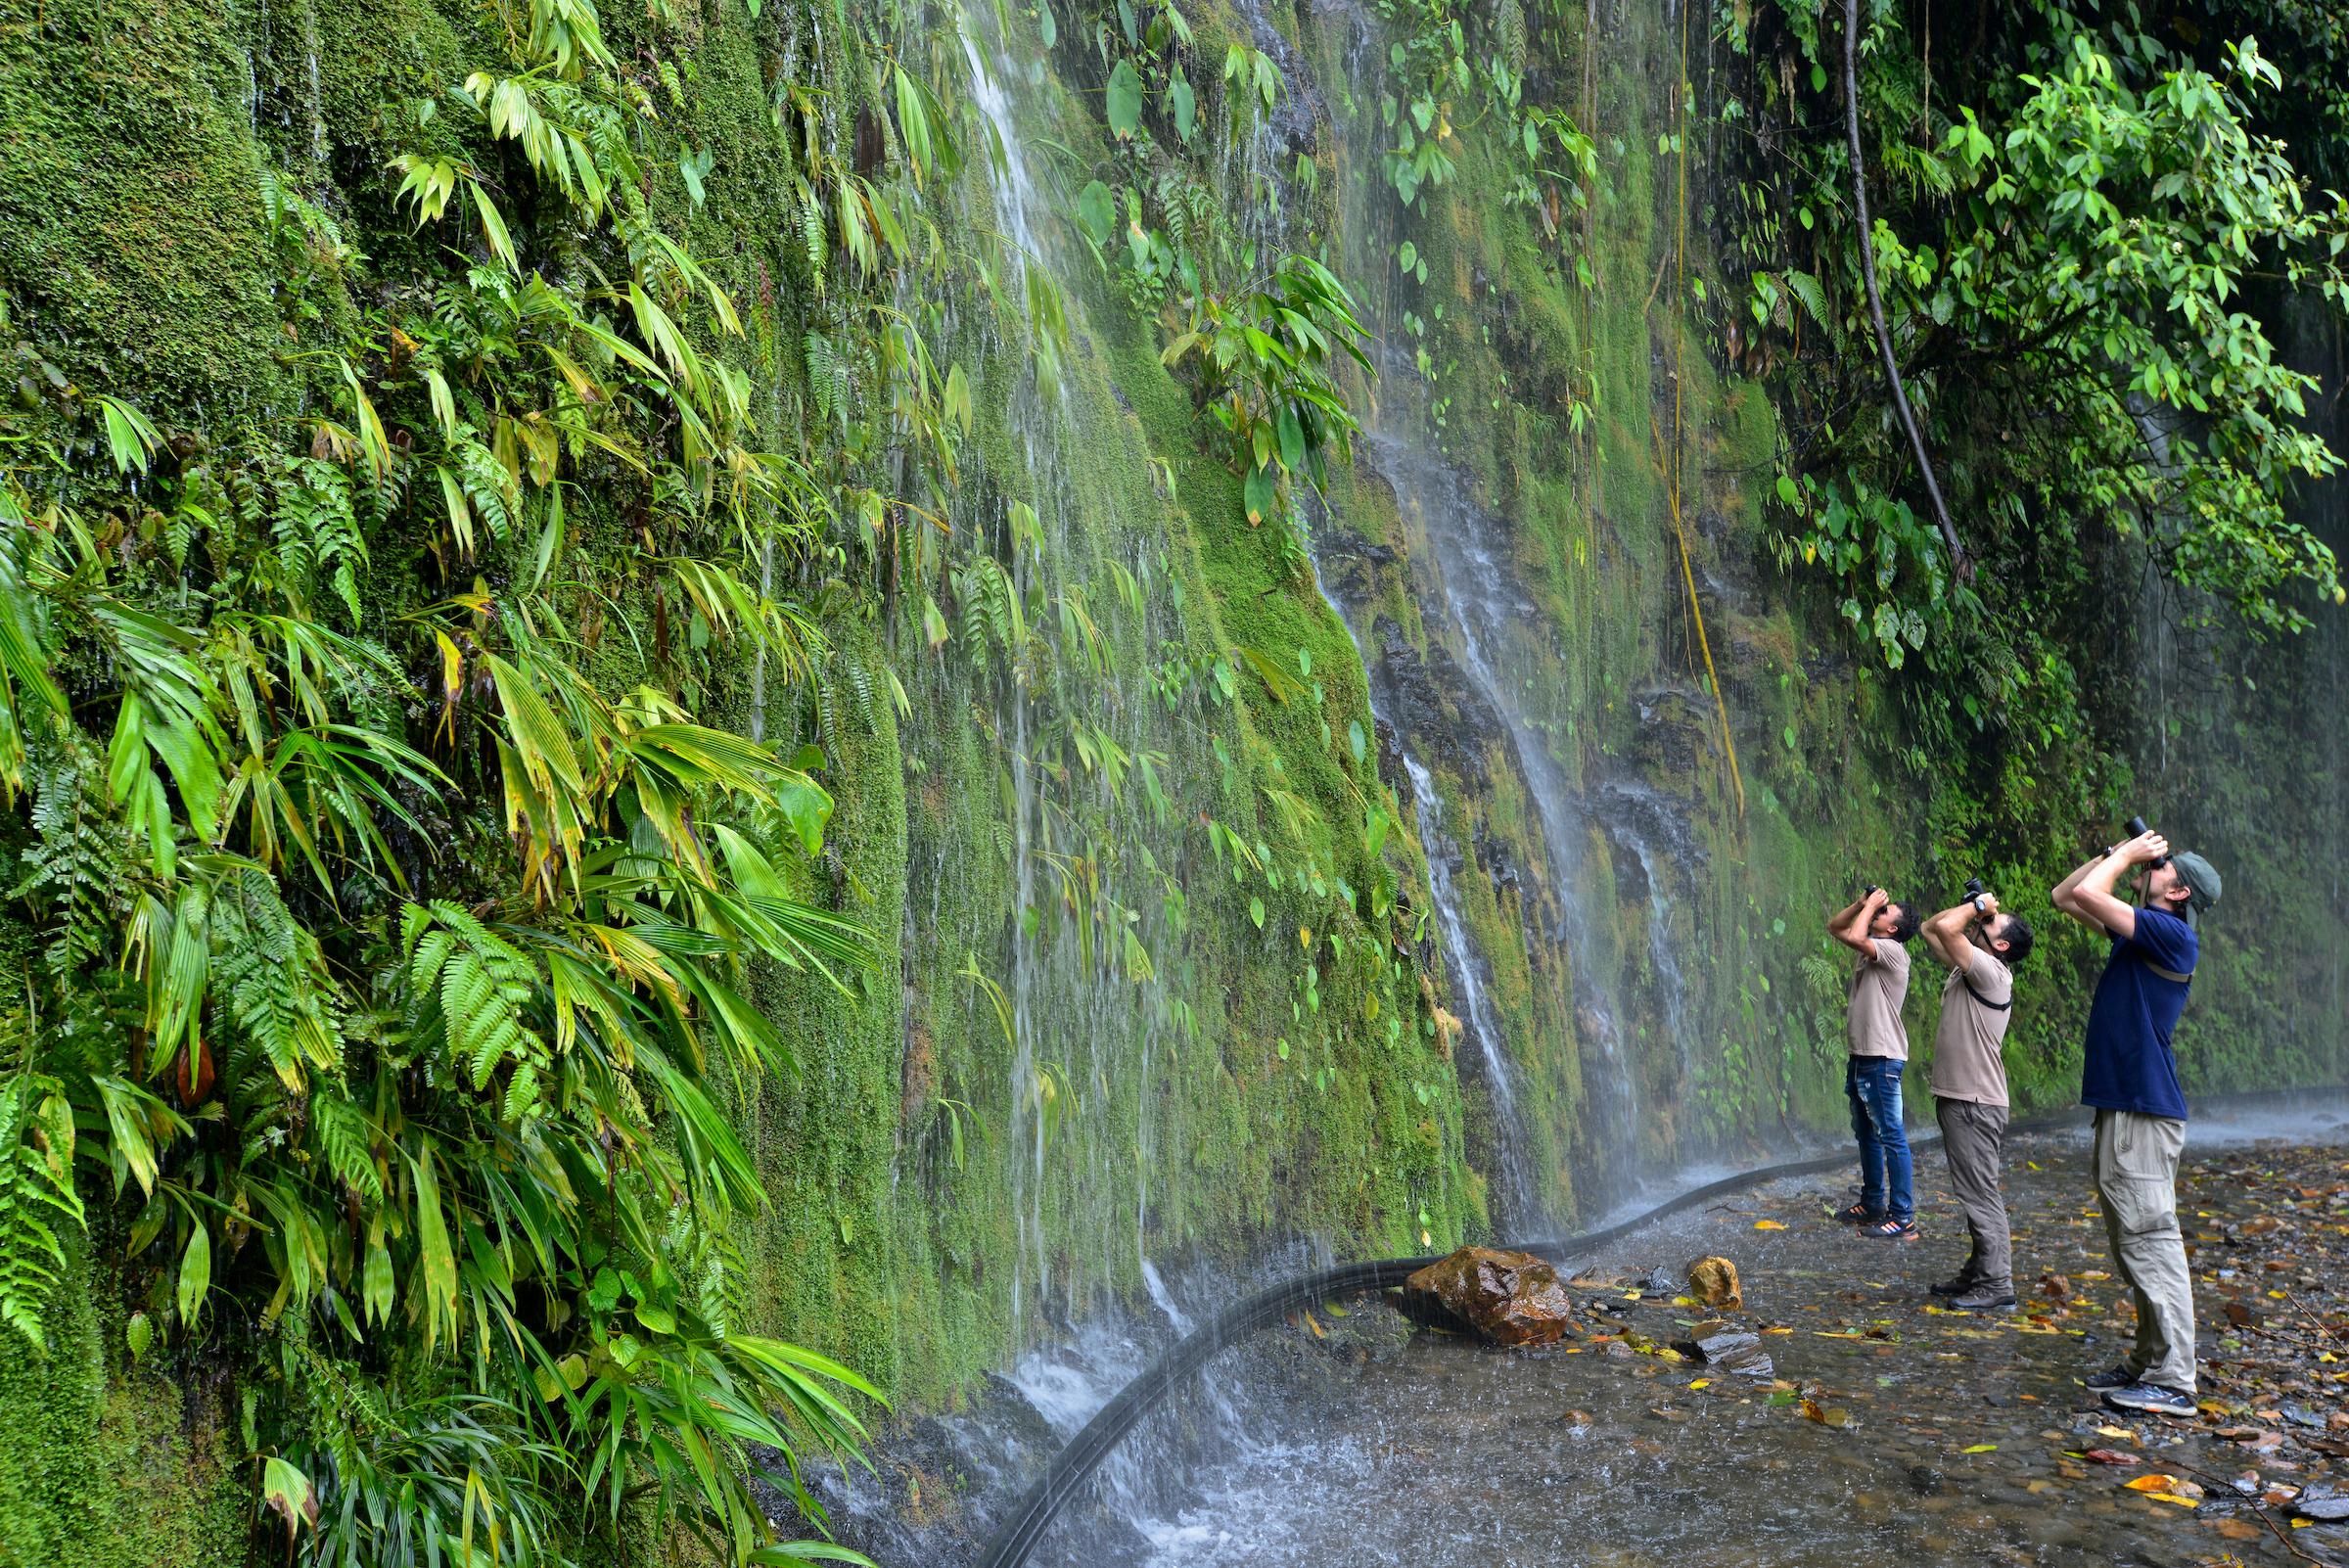 Colombia: Top Birds of the Choco Region 🎥 Birdwatching | Episode 3